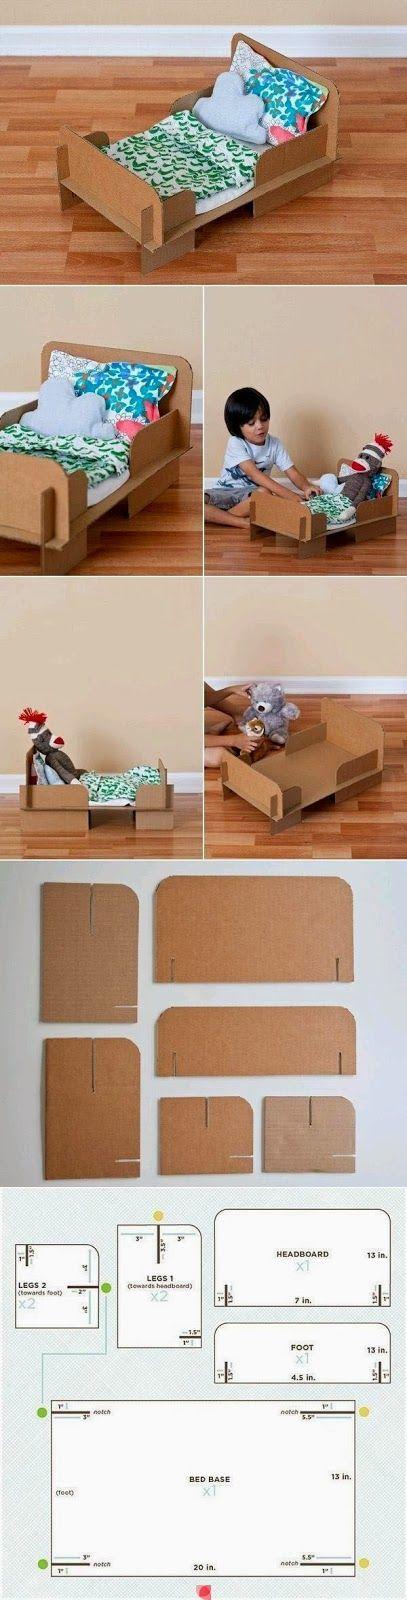 A LOT of cute things we should make! FELTRO MOLDES ARTESANATO EM GERAL: Janeiro 2014